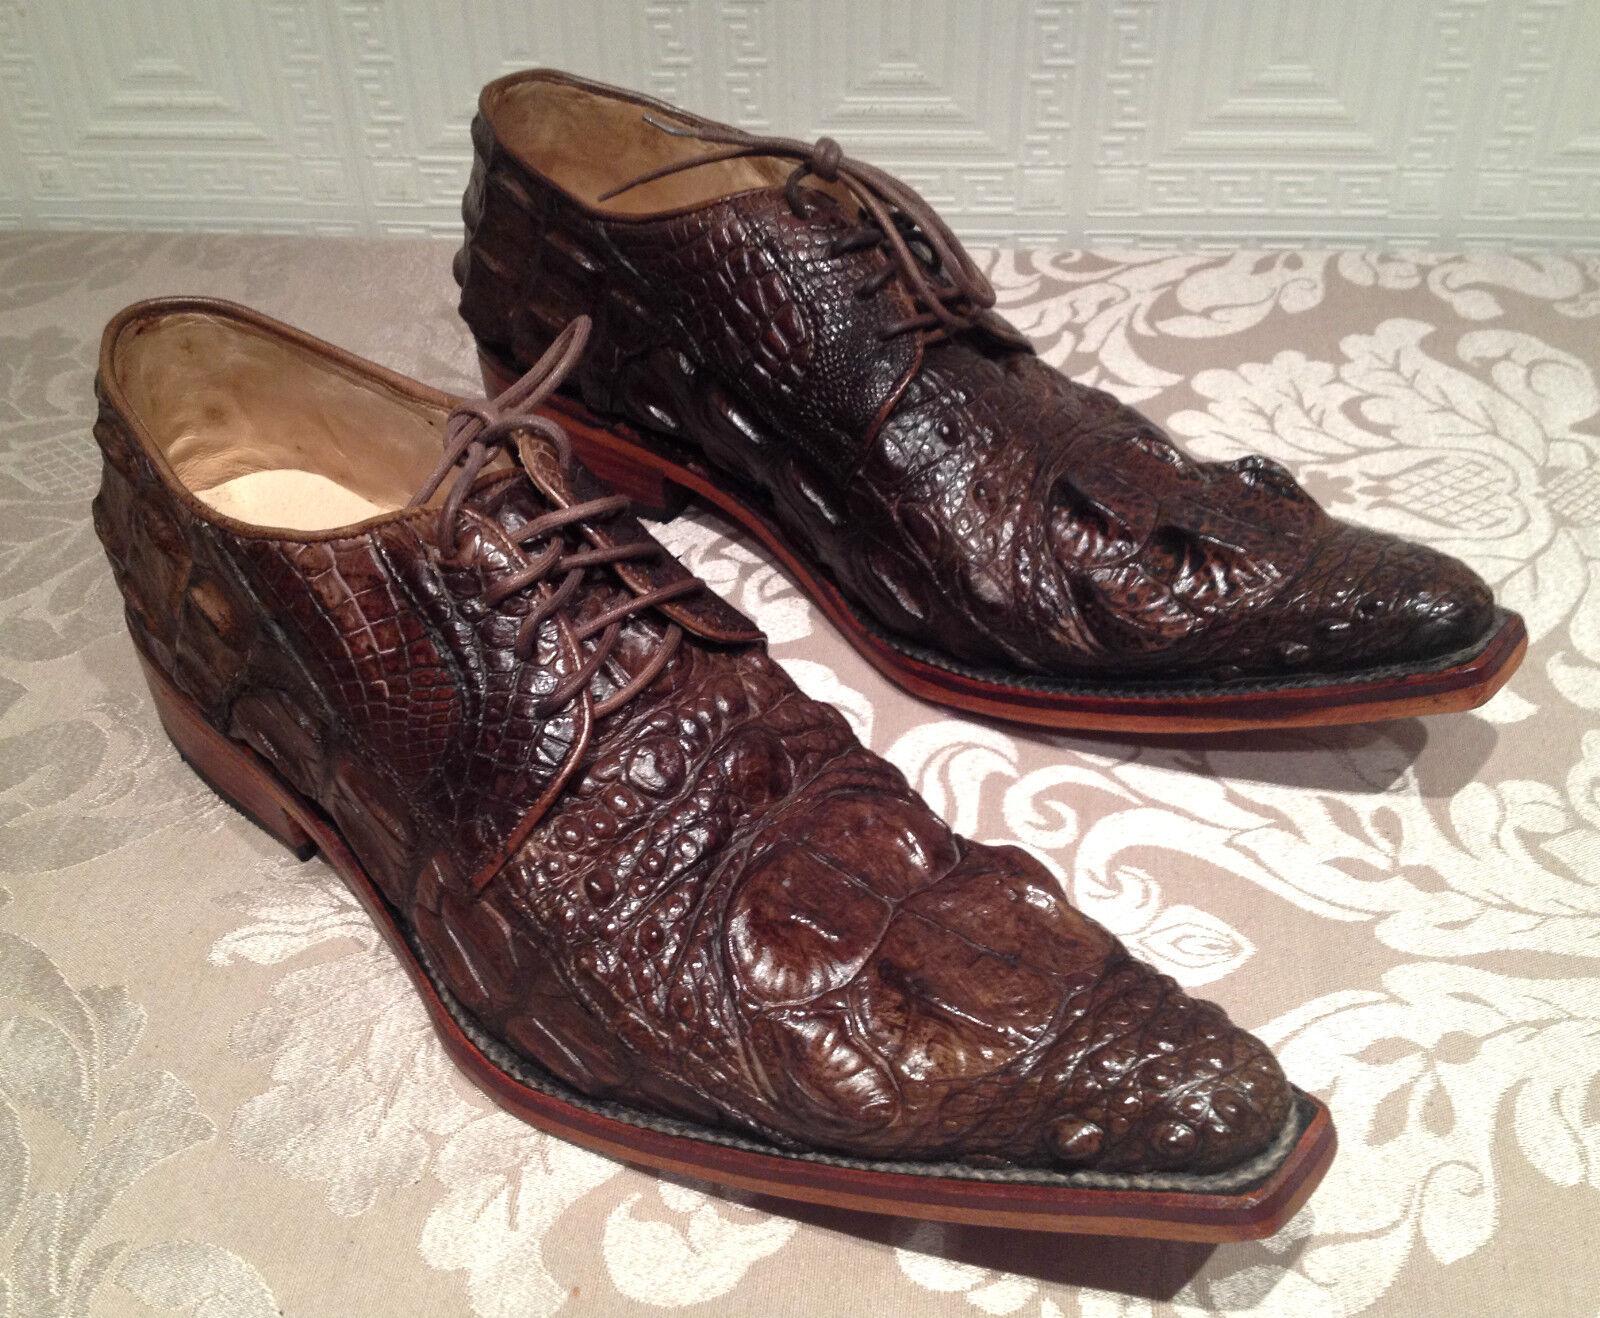 GENUINE CROCODILE SKIN Uomo SHOES LEATHER ALLIGATOR 100% (handmade shoes)